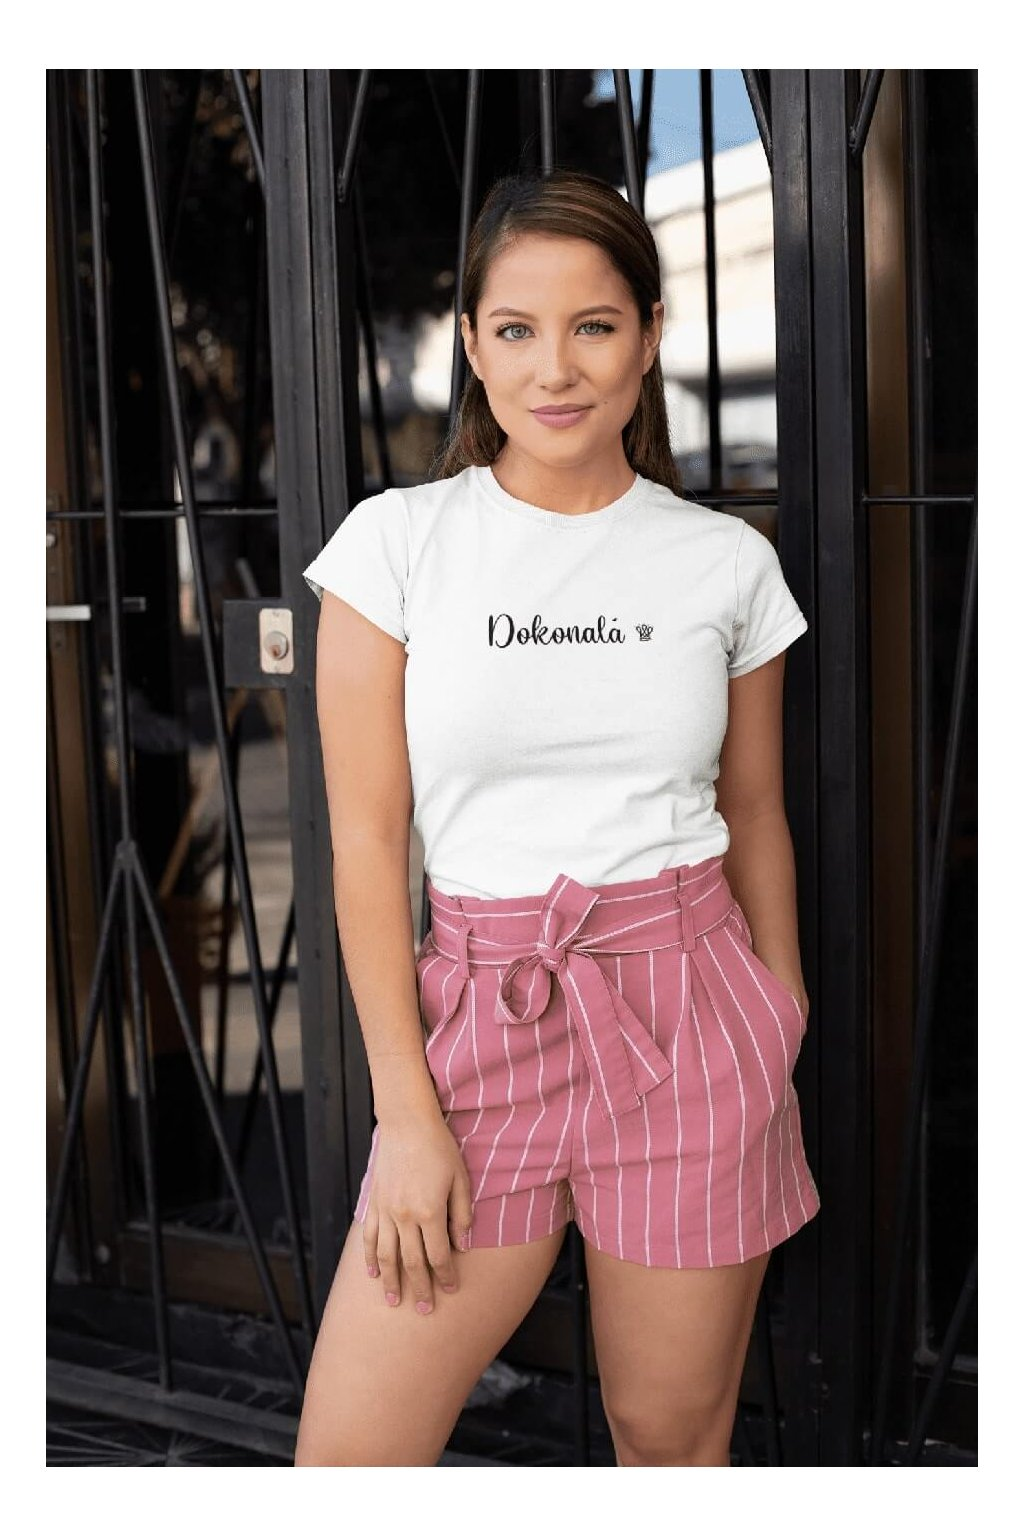 Dámske tričko Dokonalá